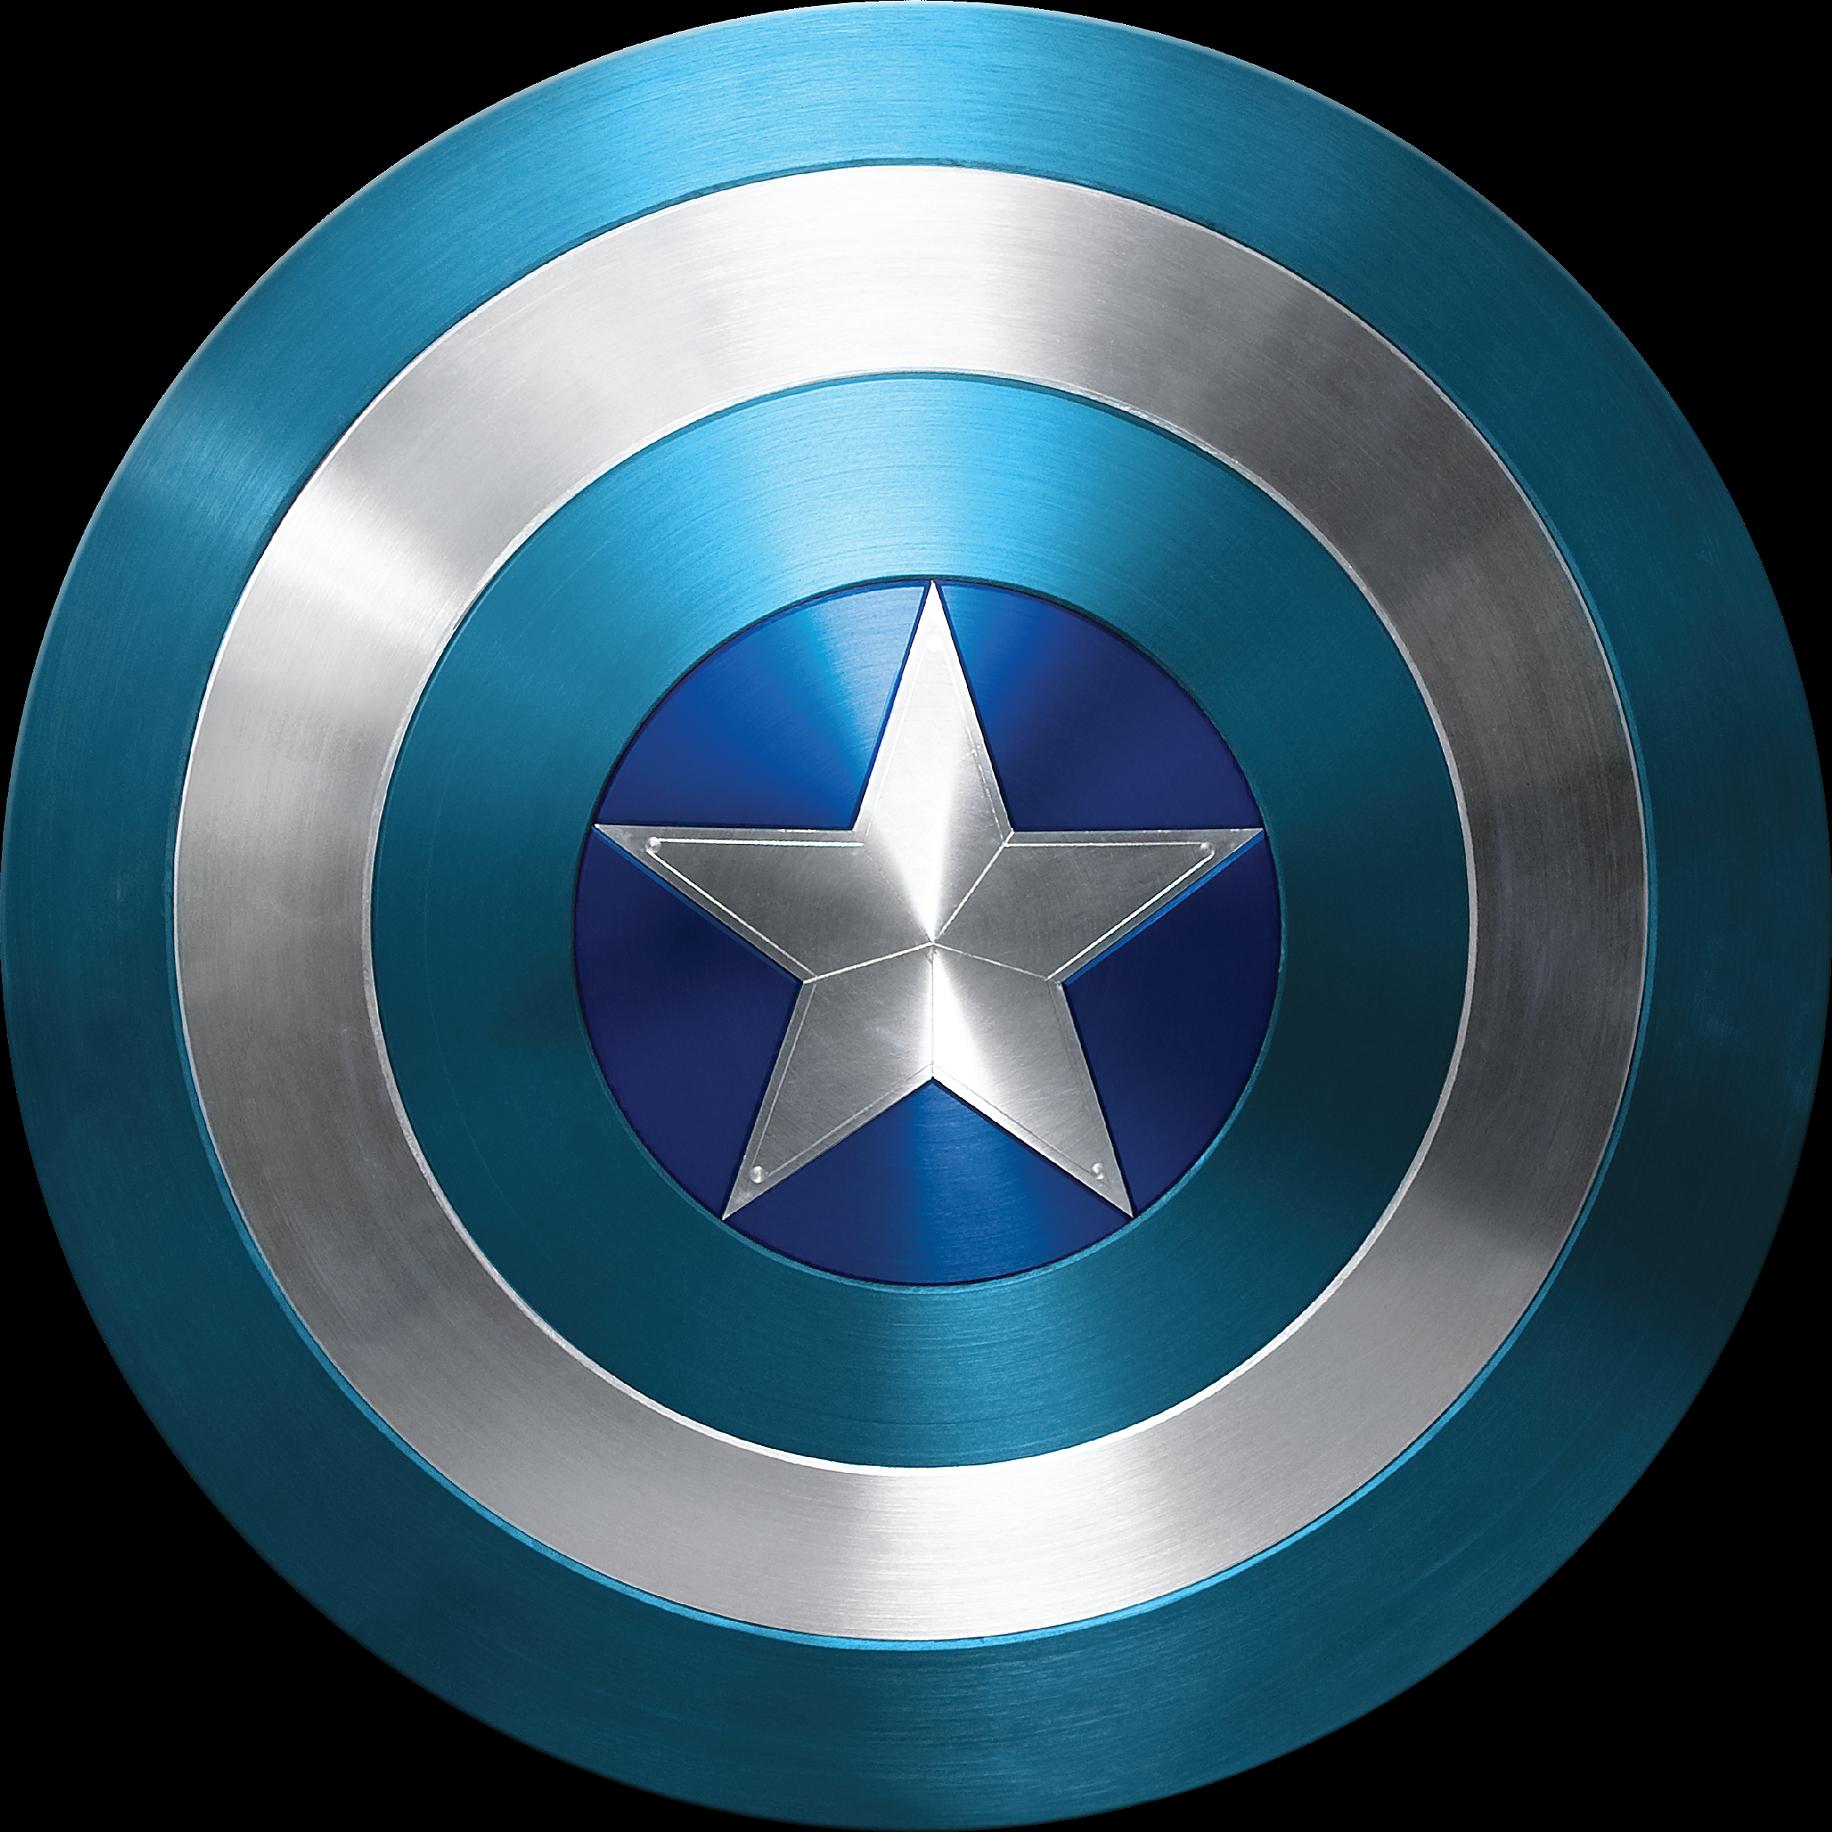 image captain america shield 3 png marvel cinematic universe